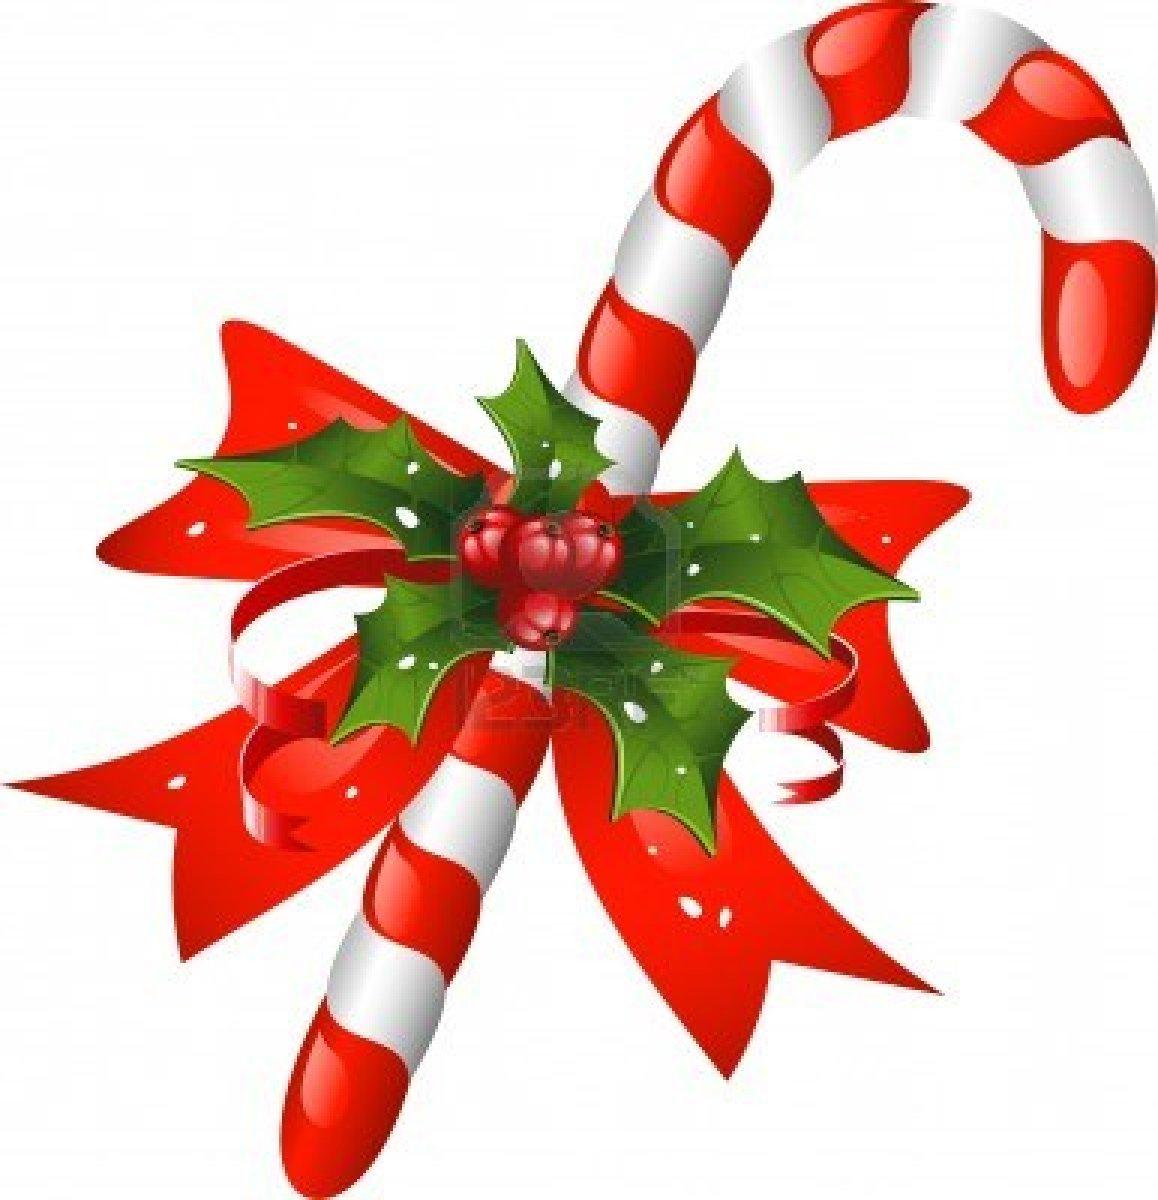 Fzwc50 | Franklins Zauberhafte Weihnachten Clipart Today à Colorino A Imprimer